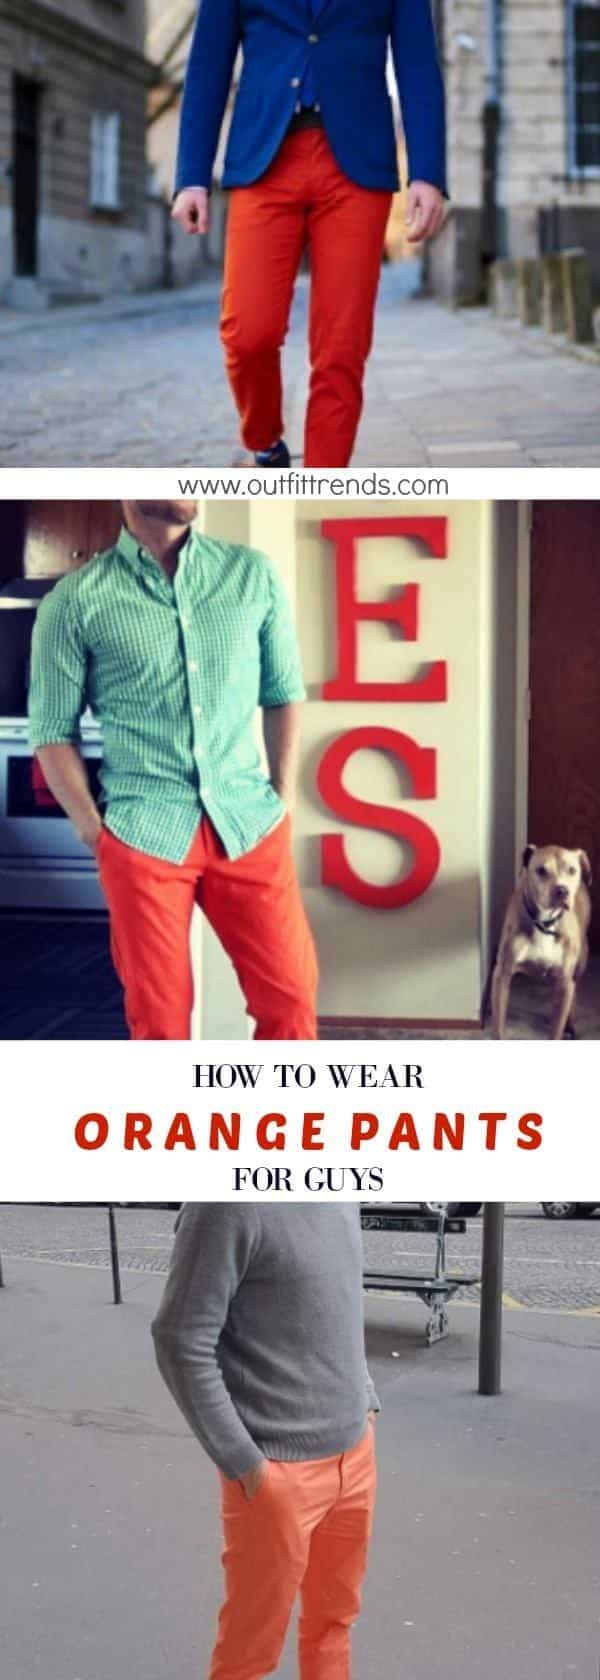 orange Men's Orange Pants Outfits-35 Best Ways to Wear Orange Pants